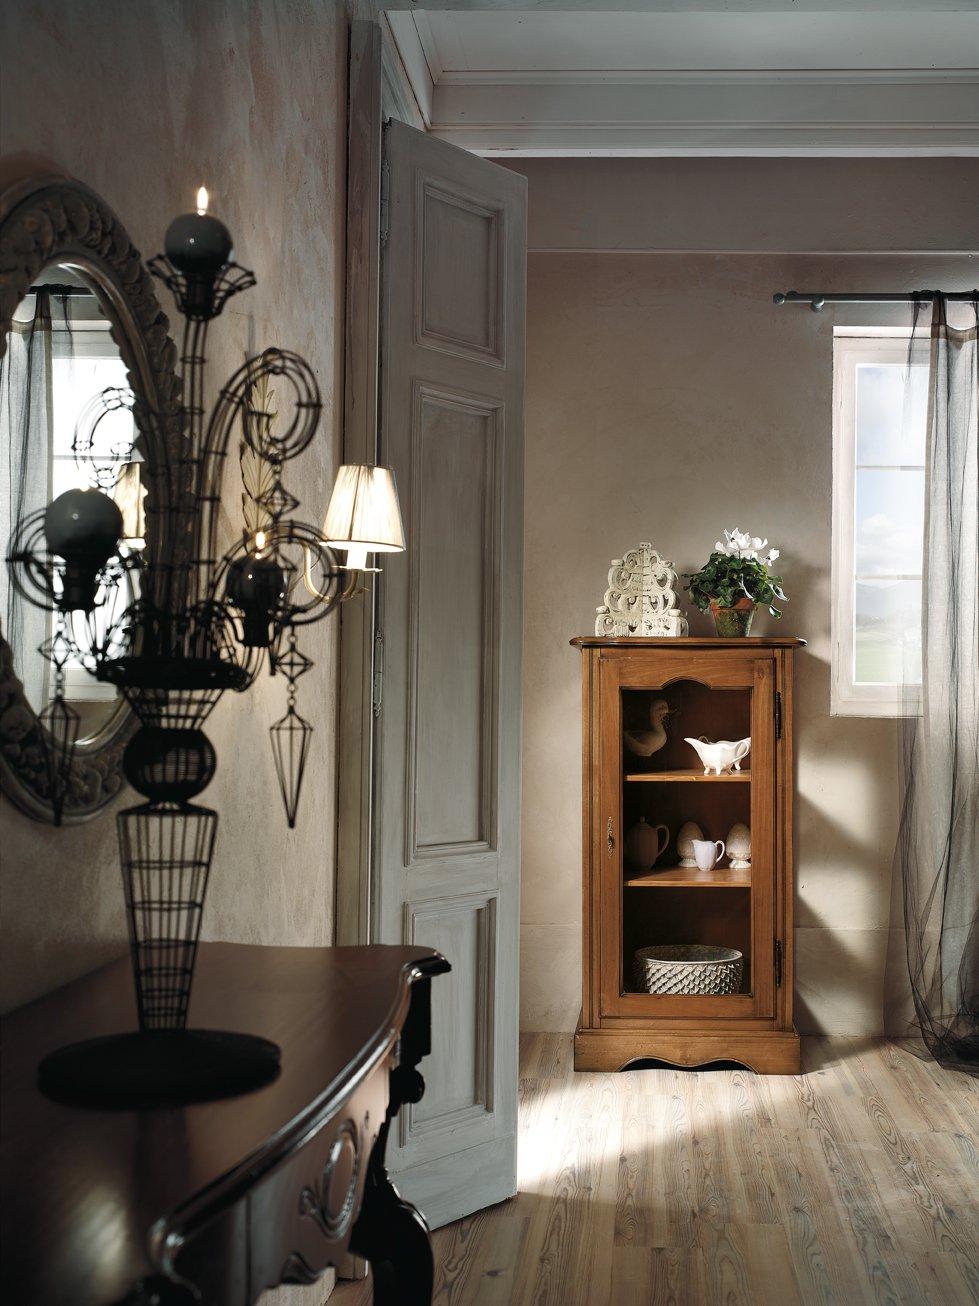 Vetrina 1 anta mobili in stile linea la maison - La maison mobili ...